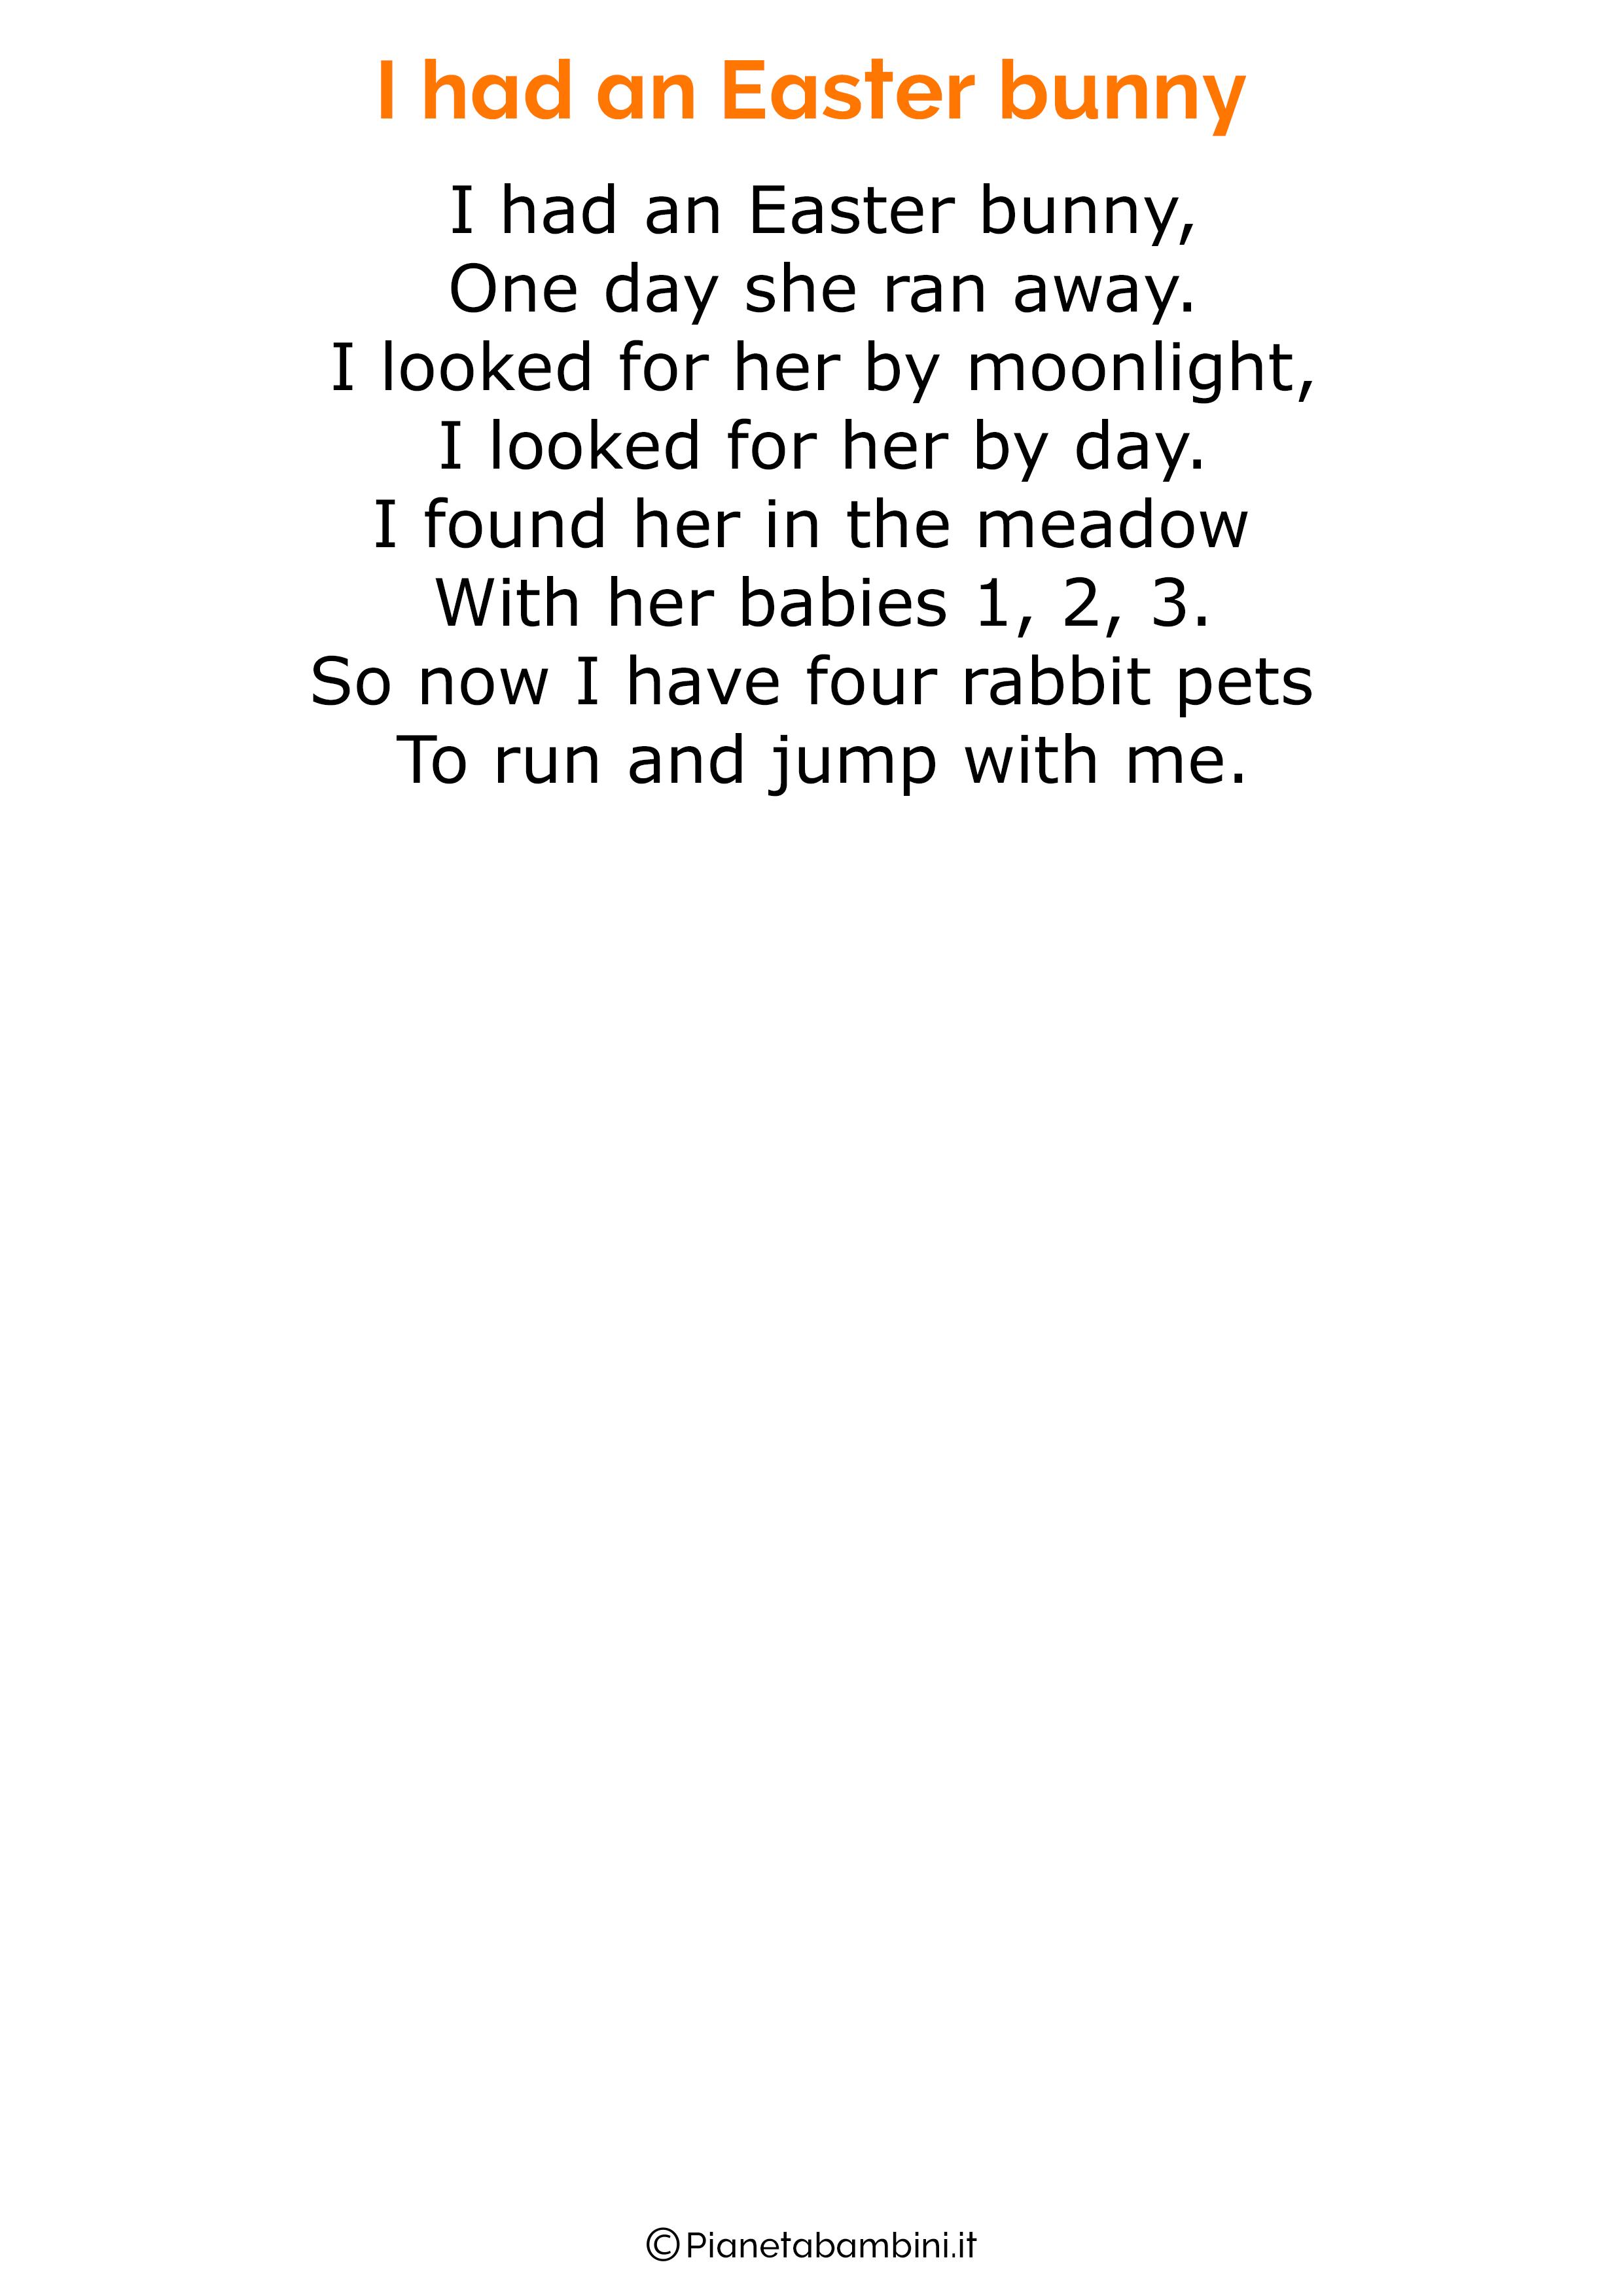 Poesie di Pasqua in inglese per bambini 18